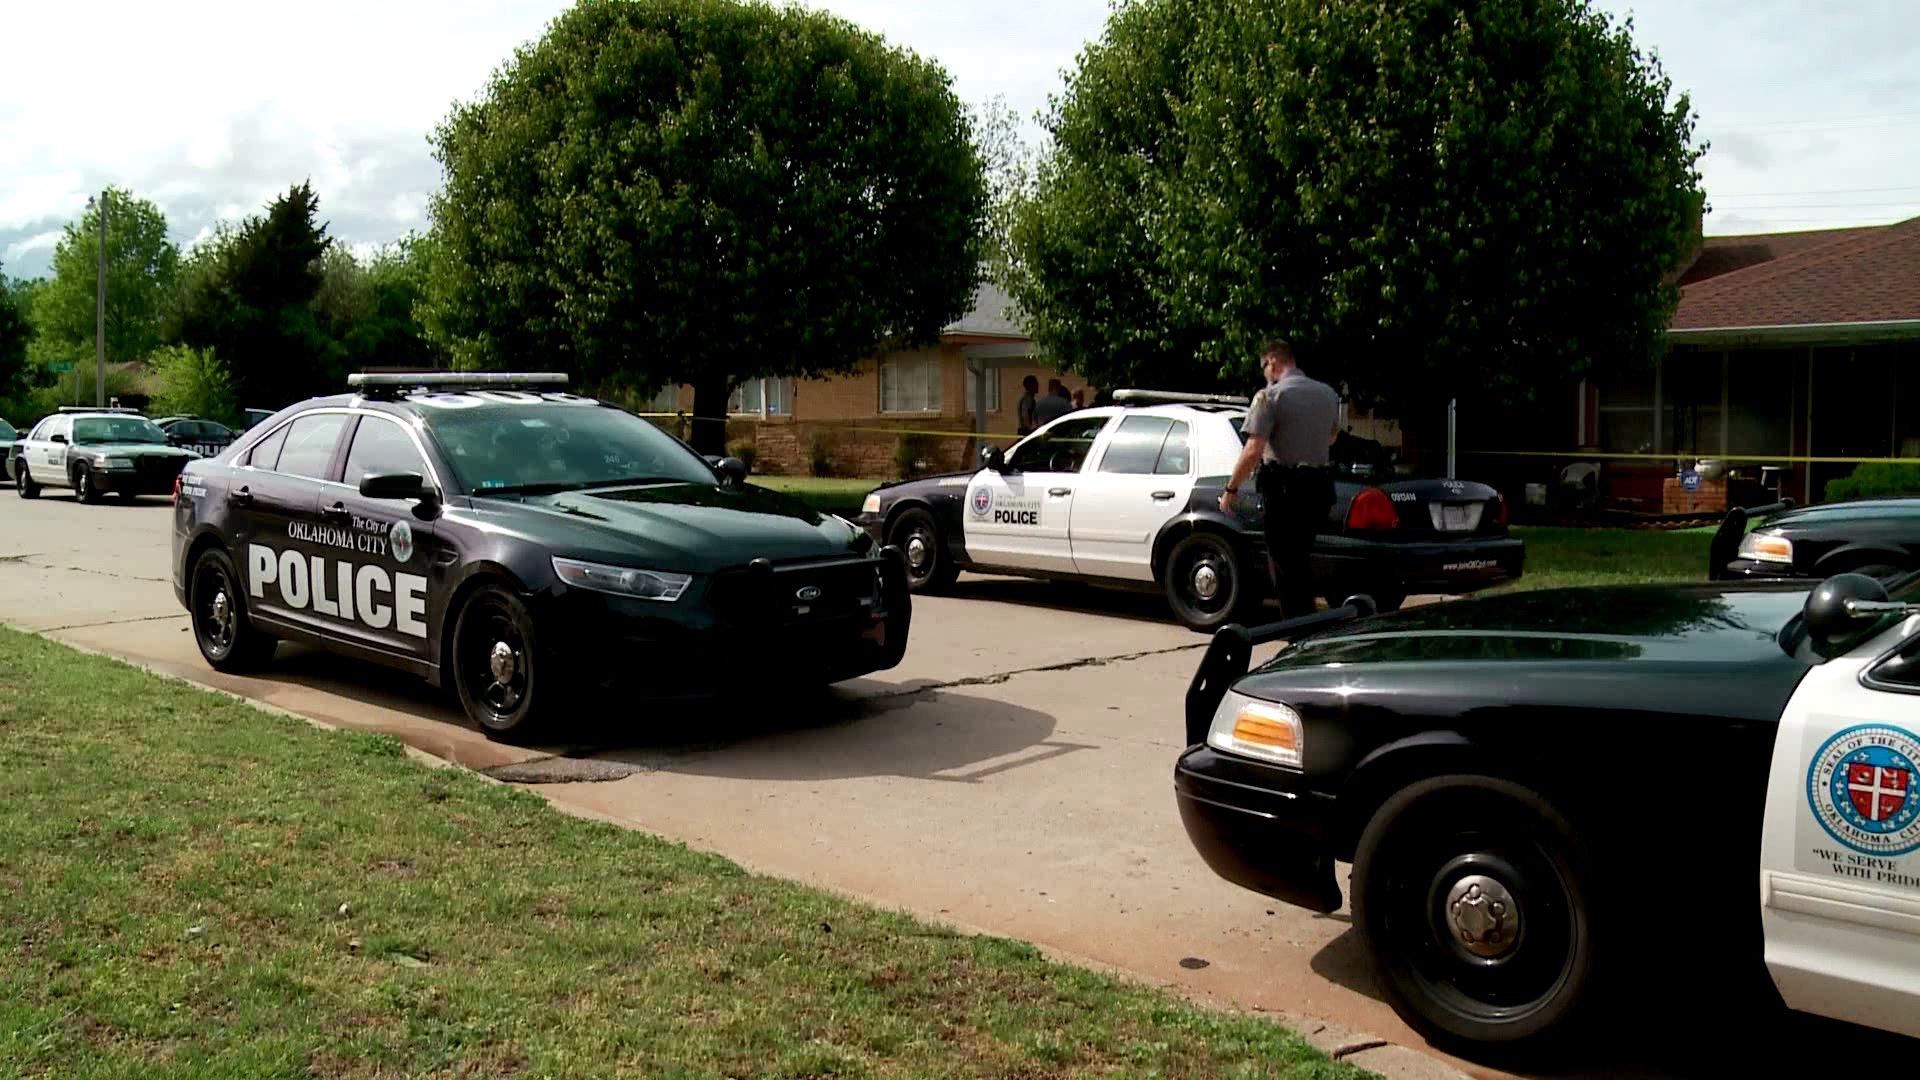 Suspect apprehended near NE 45th/Prospect